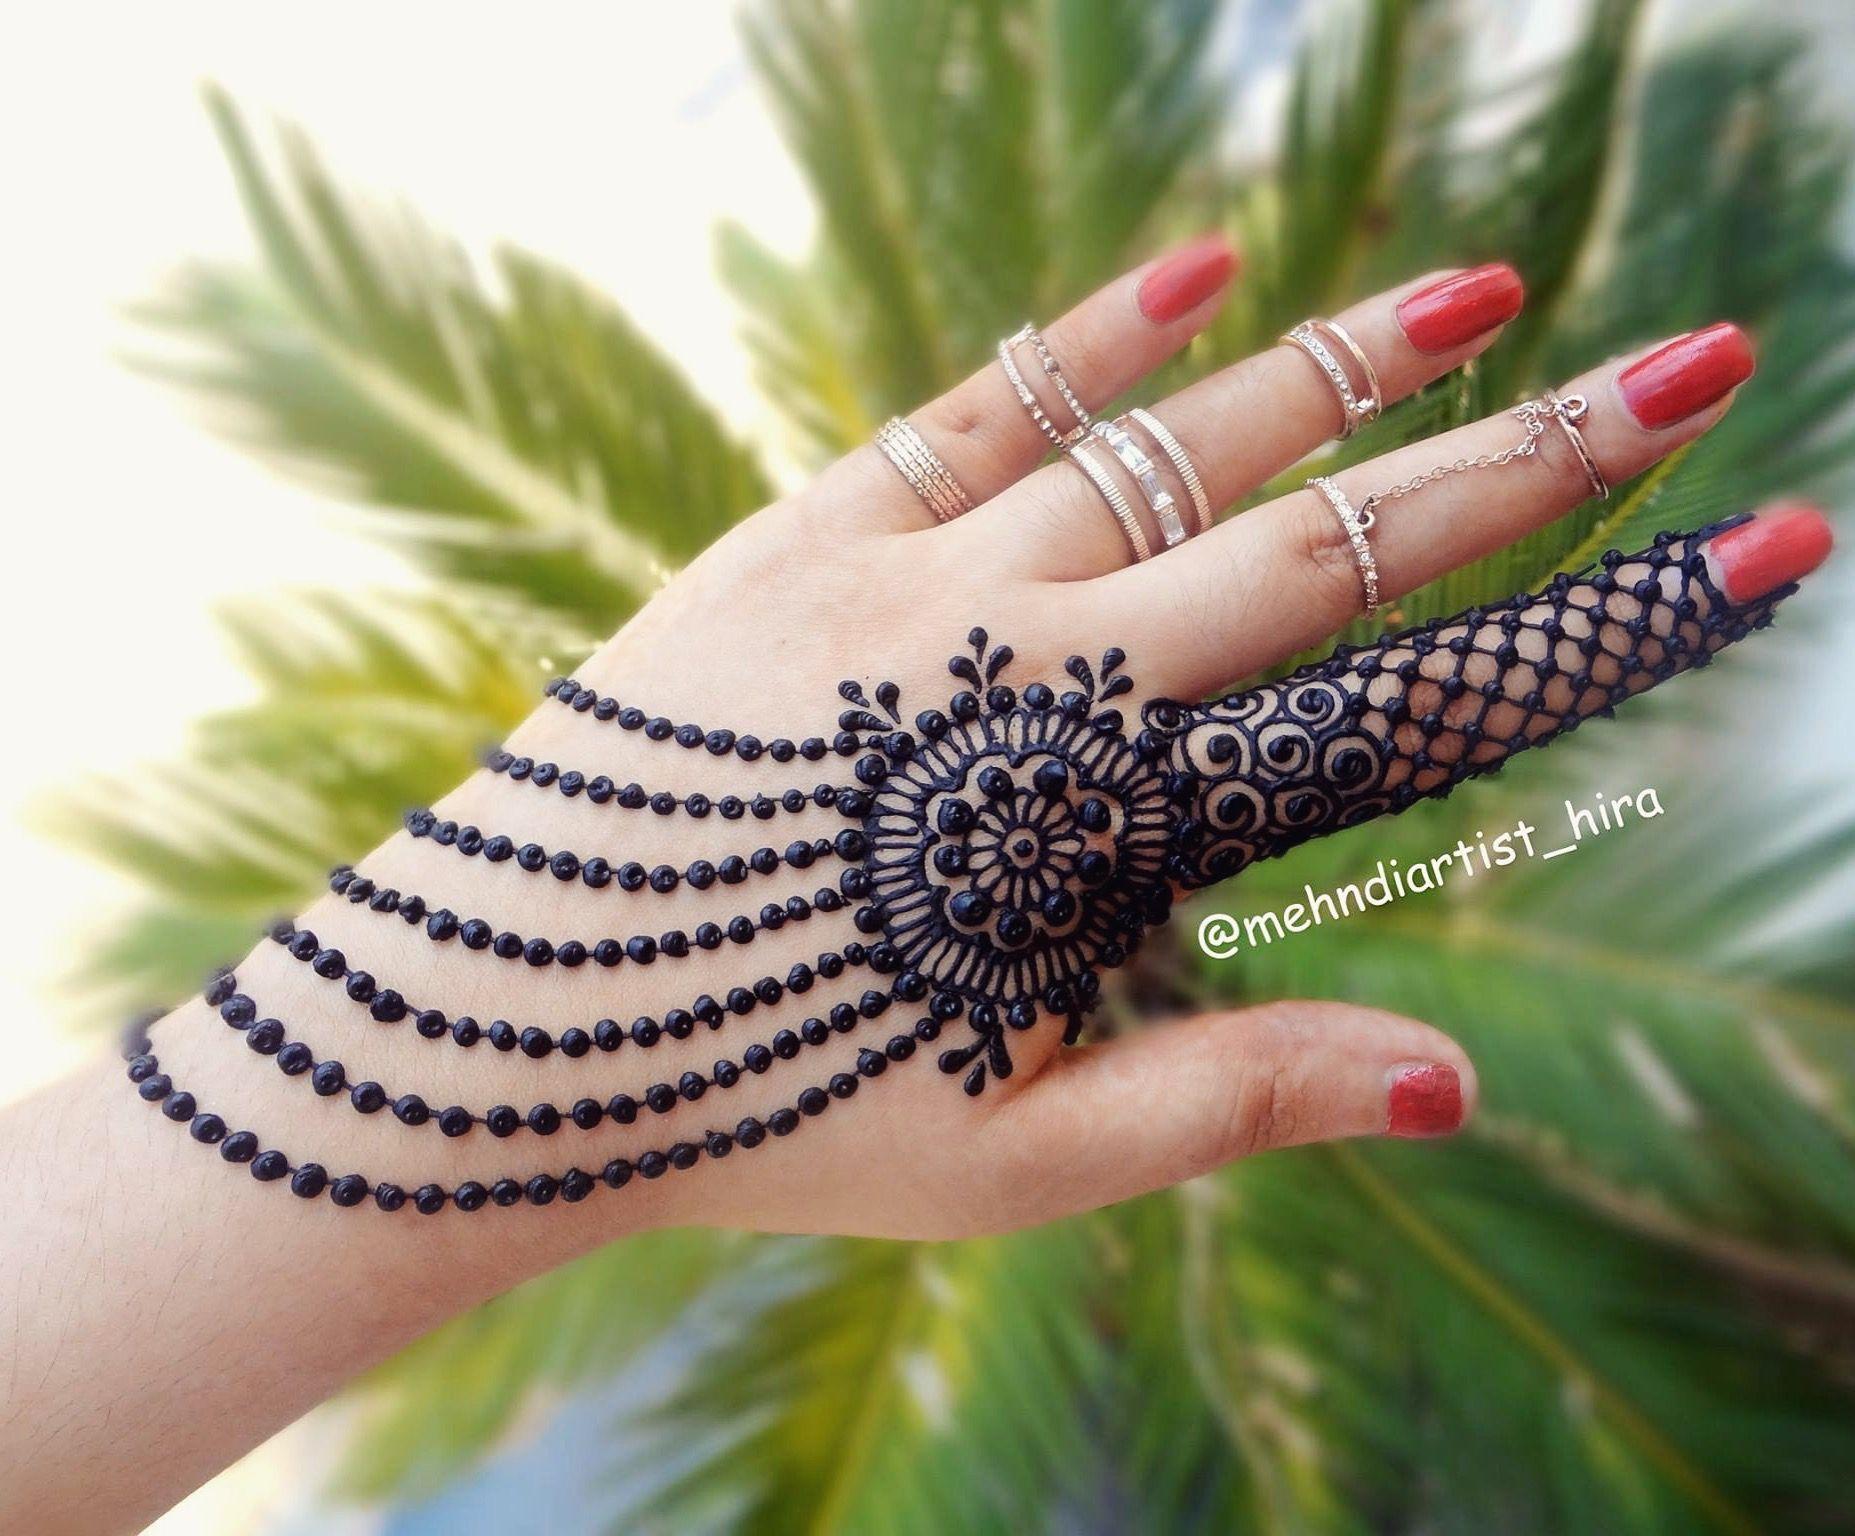 Mehndi Heart Meaning : Pin by prachi gulati on mehendi hennas mehndi and